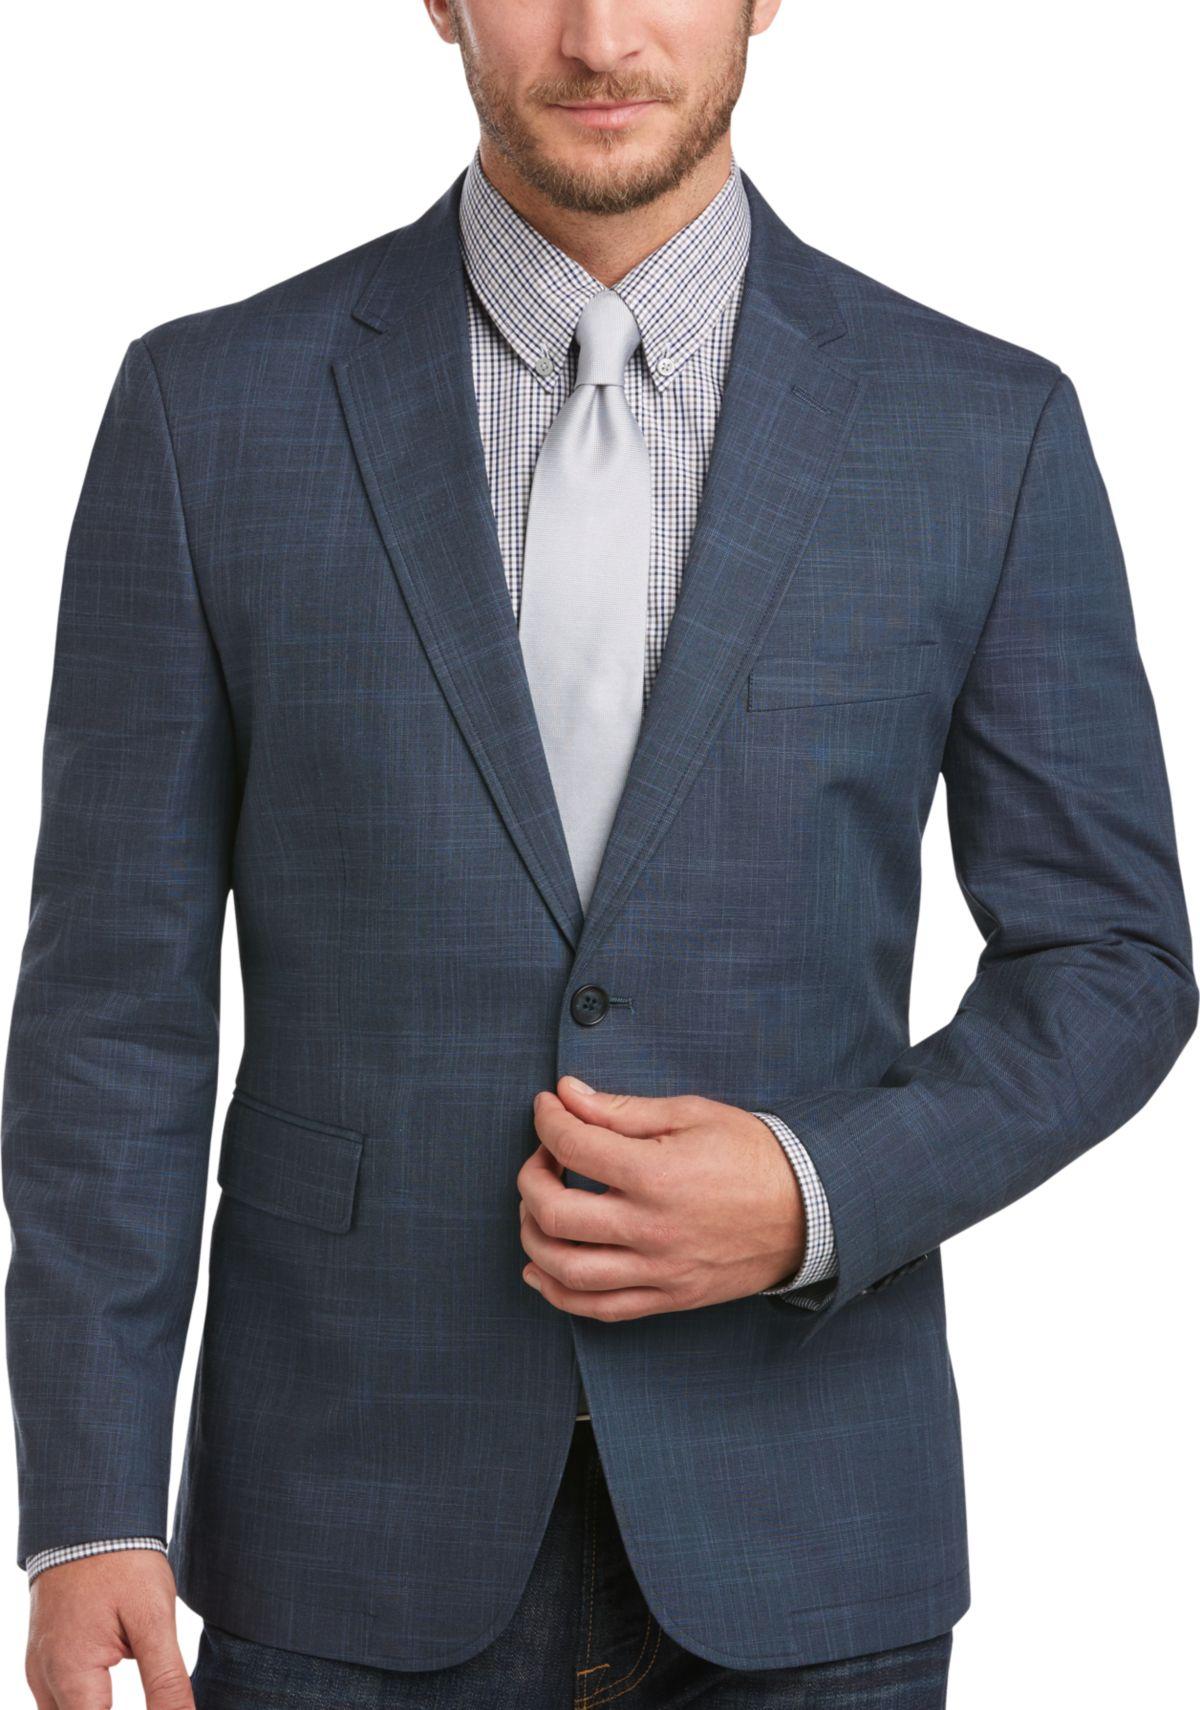 Casual Coats - Shop Designer Men's Casual Jackets | Men's Wearhouse